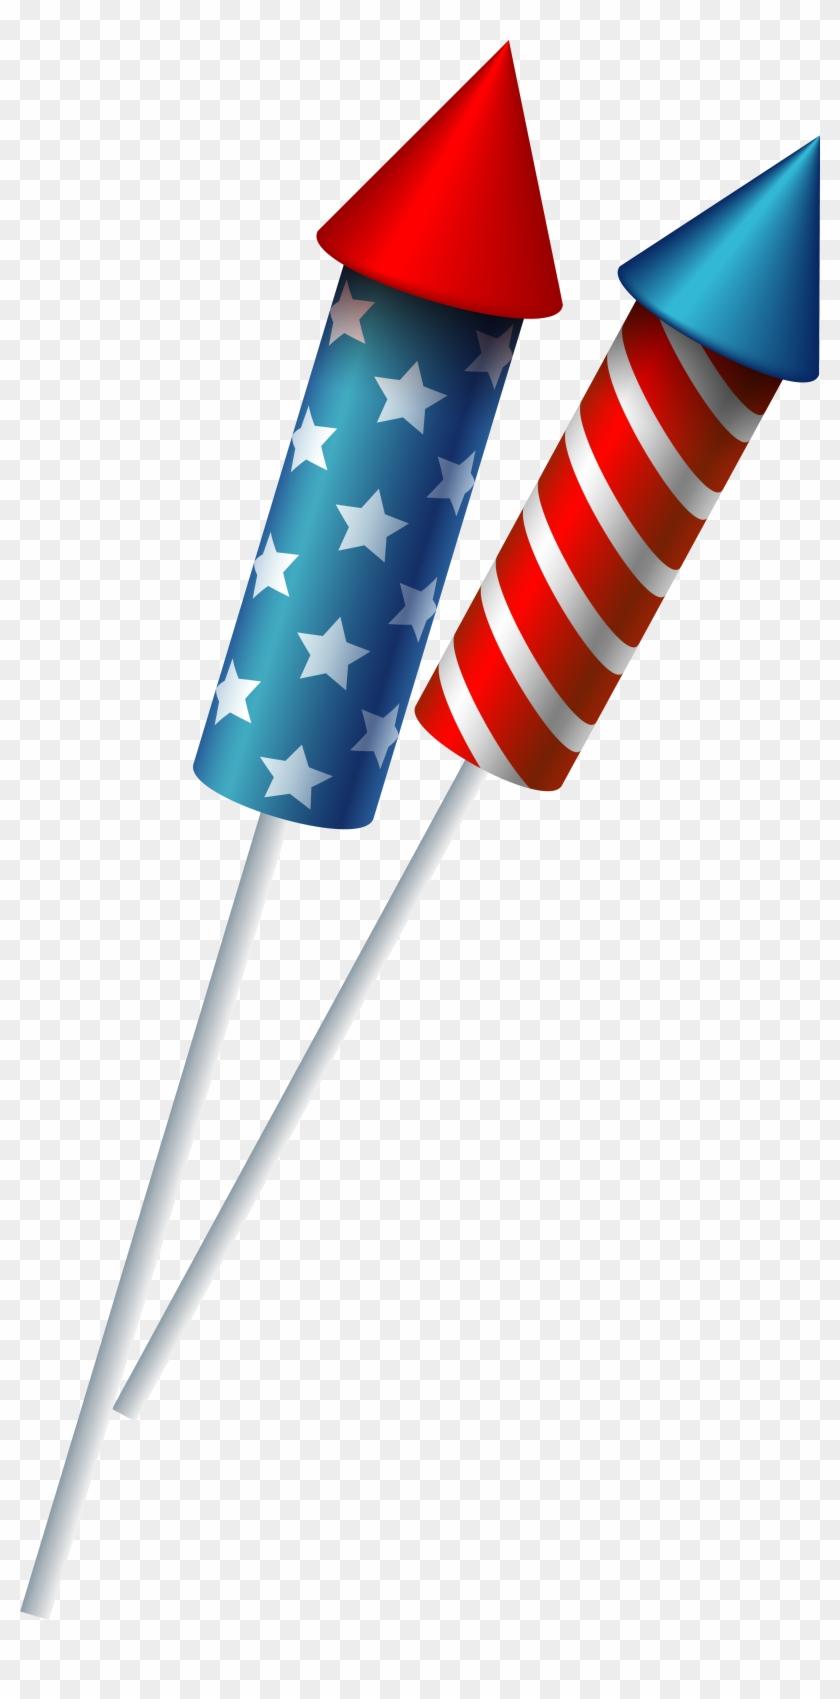 Usa Fireworks Png #25675